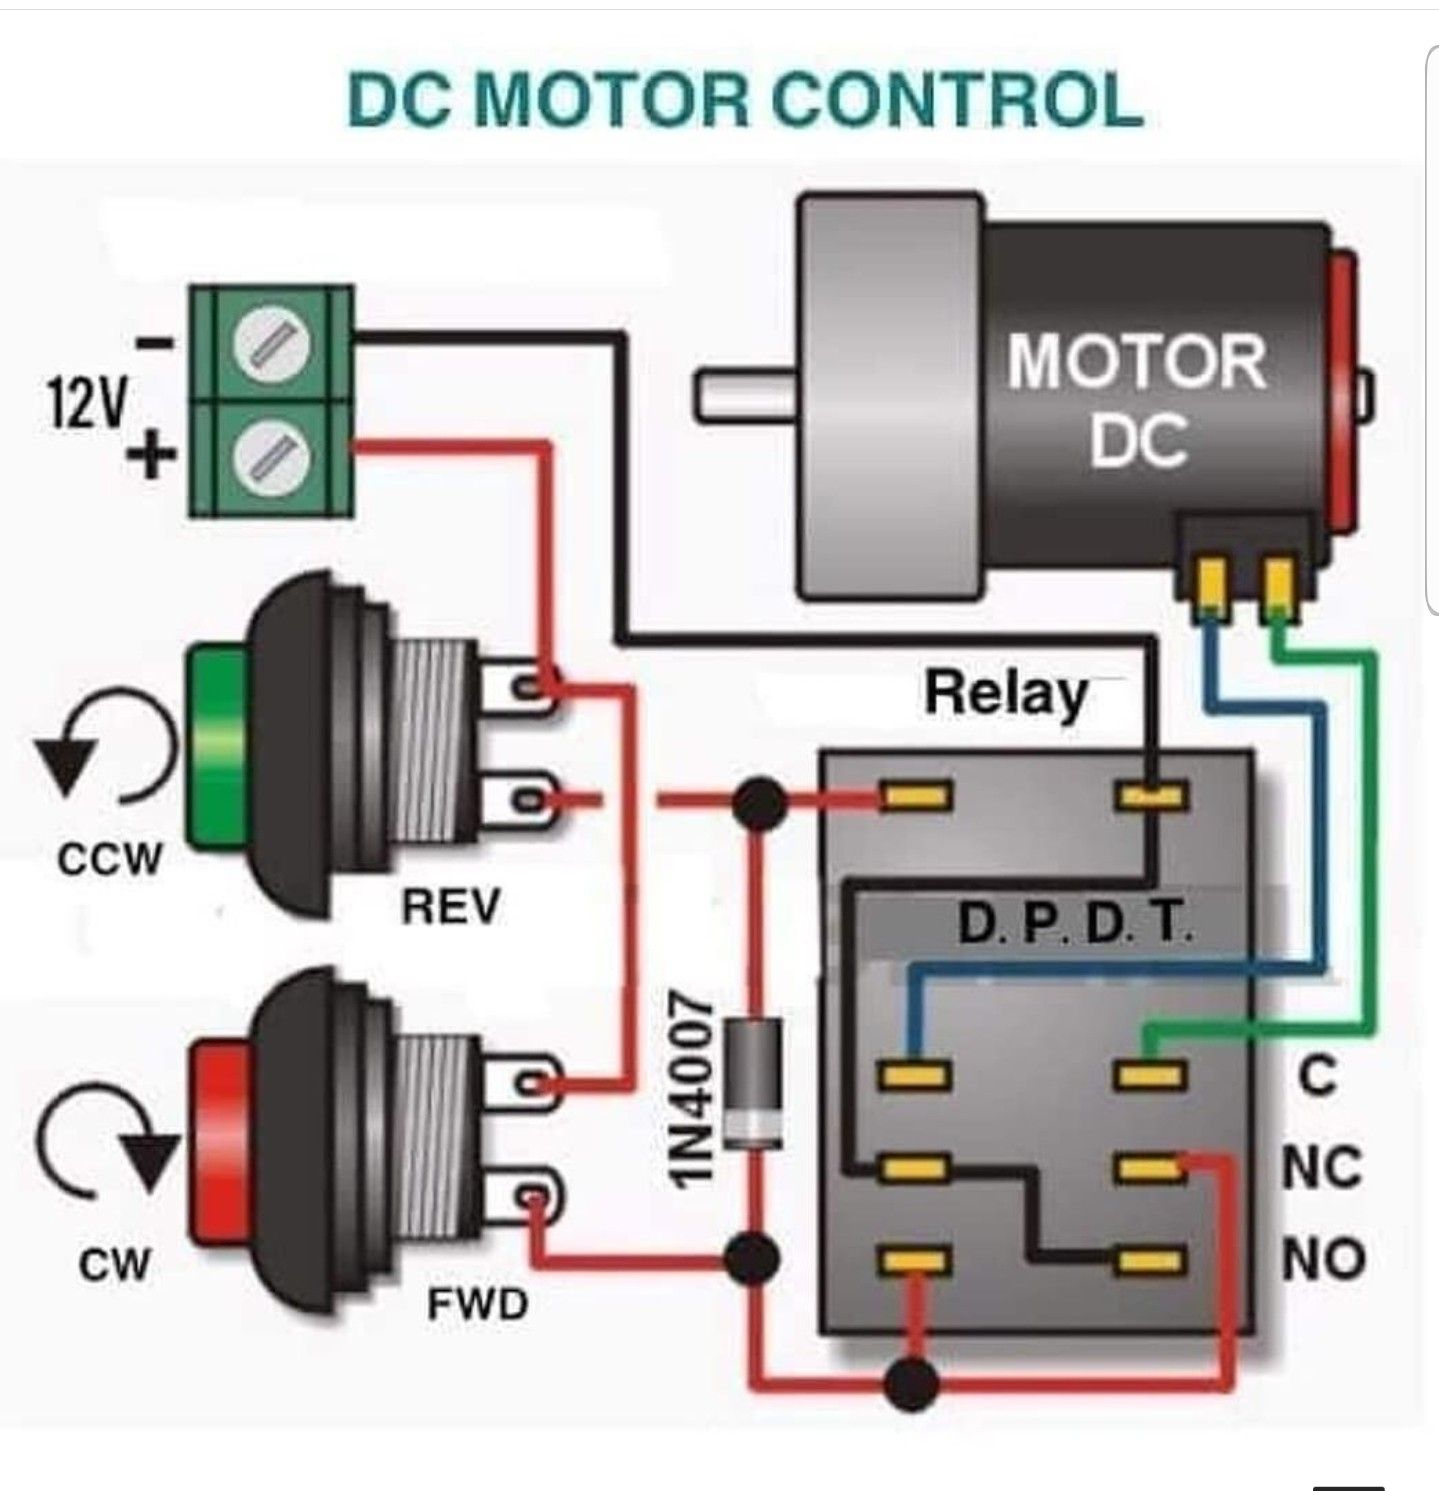 Pin By Hai Ho On Jednosmerni Motor Cw Ccw Electronics Projects Diy Electronics Basics Electronic Circuit Design